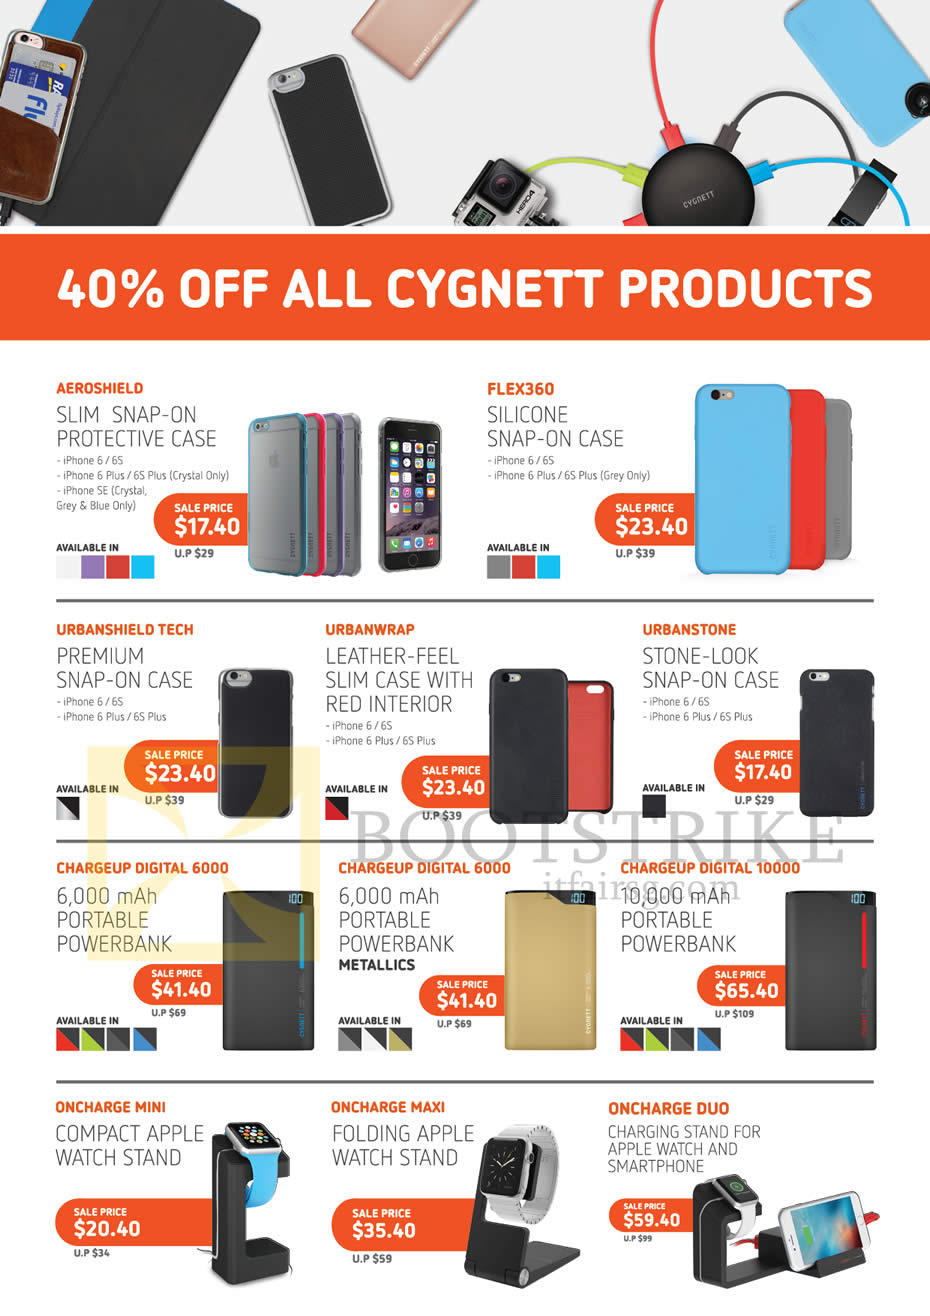 COMEX 2016 price list image brochure of Nubox Cygnett Cases, Aeroshield, Flex360, Urbanshield, Urbanwrap, Urbanstone, Chargeup, Oncharge